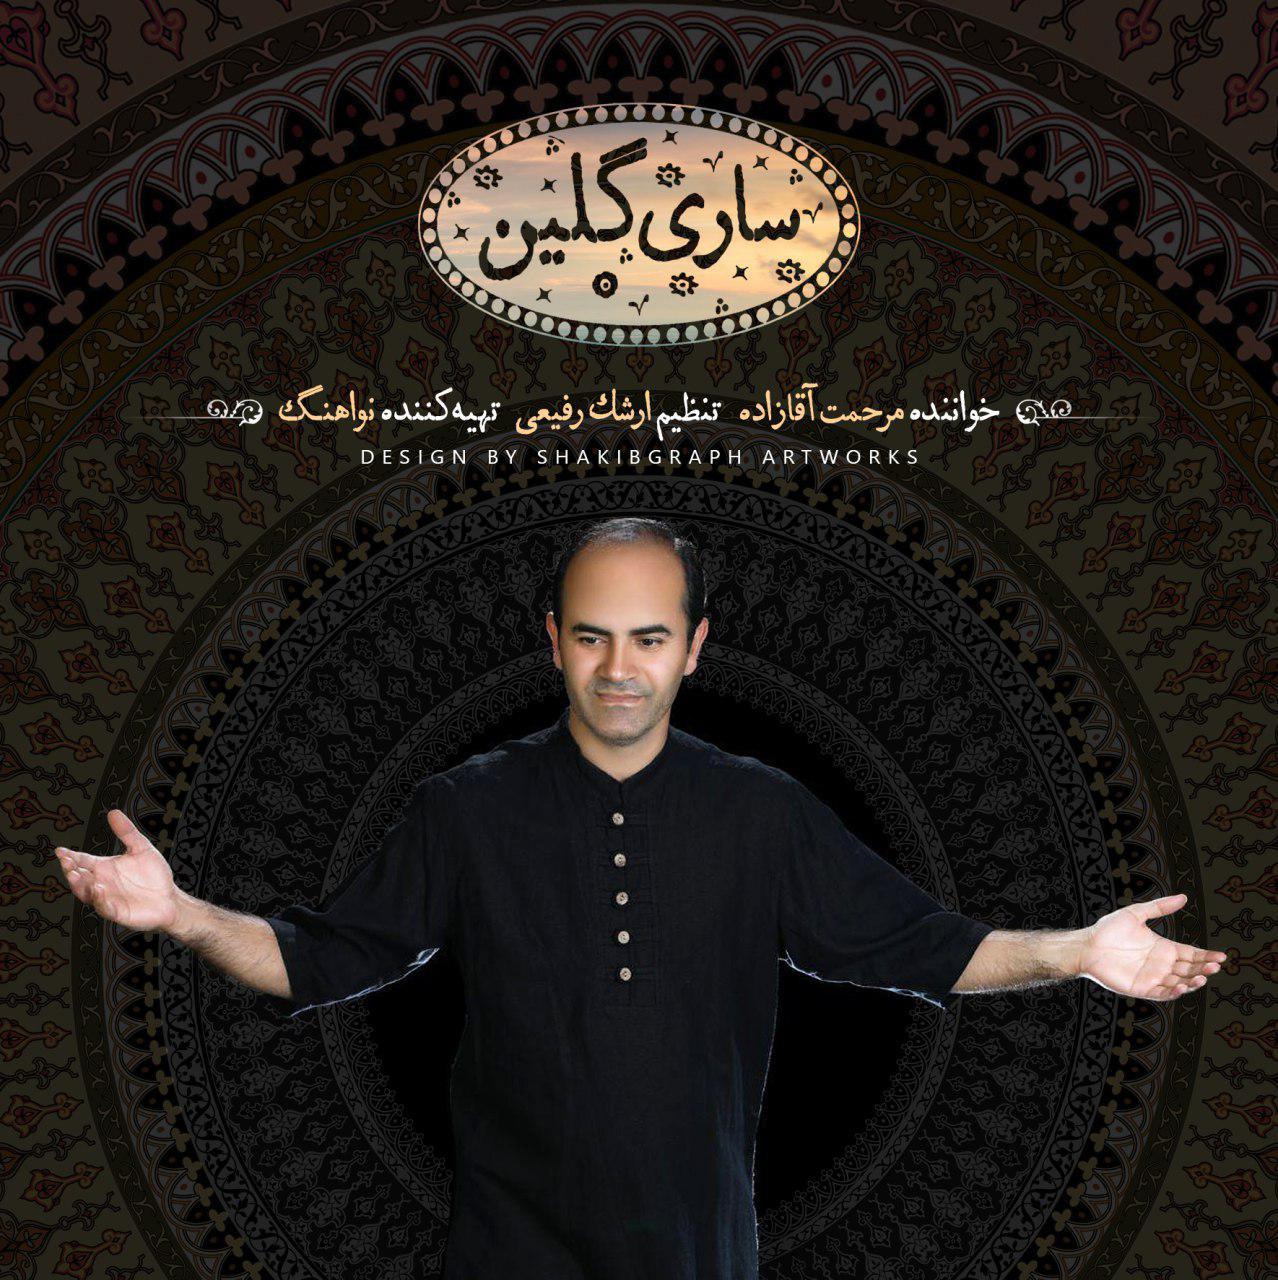 http://s9.picofile.com/file/8332289884/20Marhamat_Aghazadeh_Sari_Galin.jpg